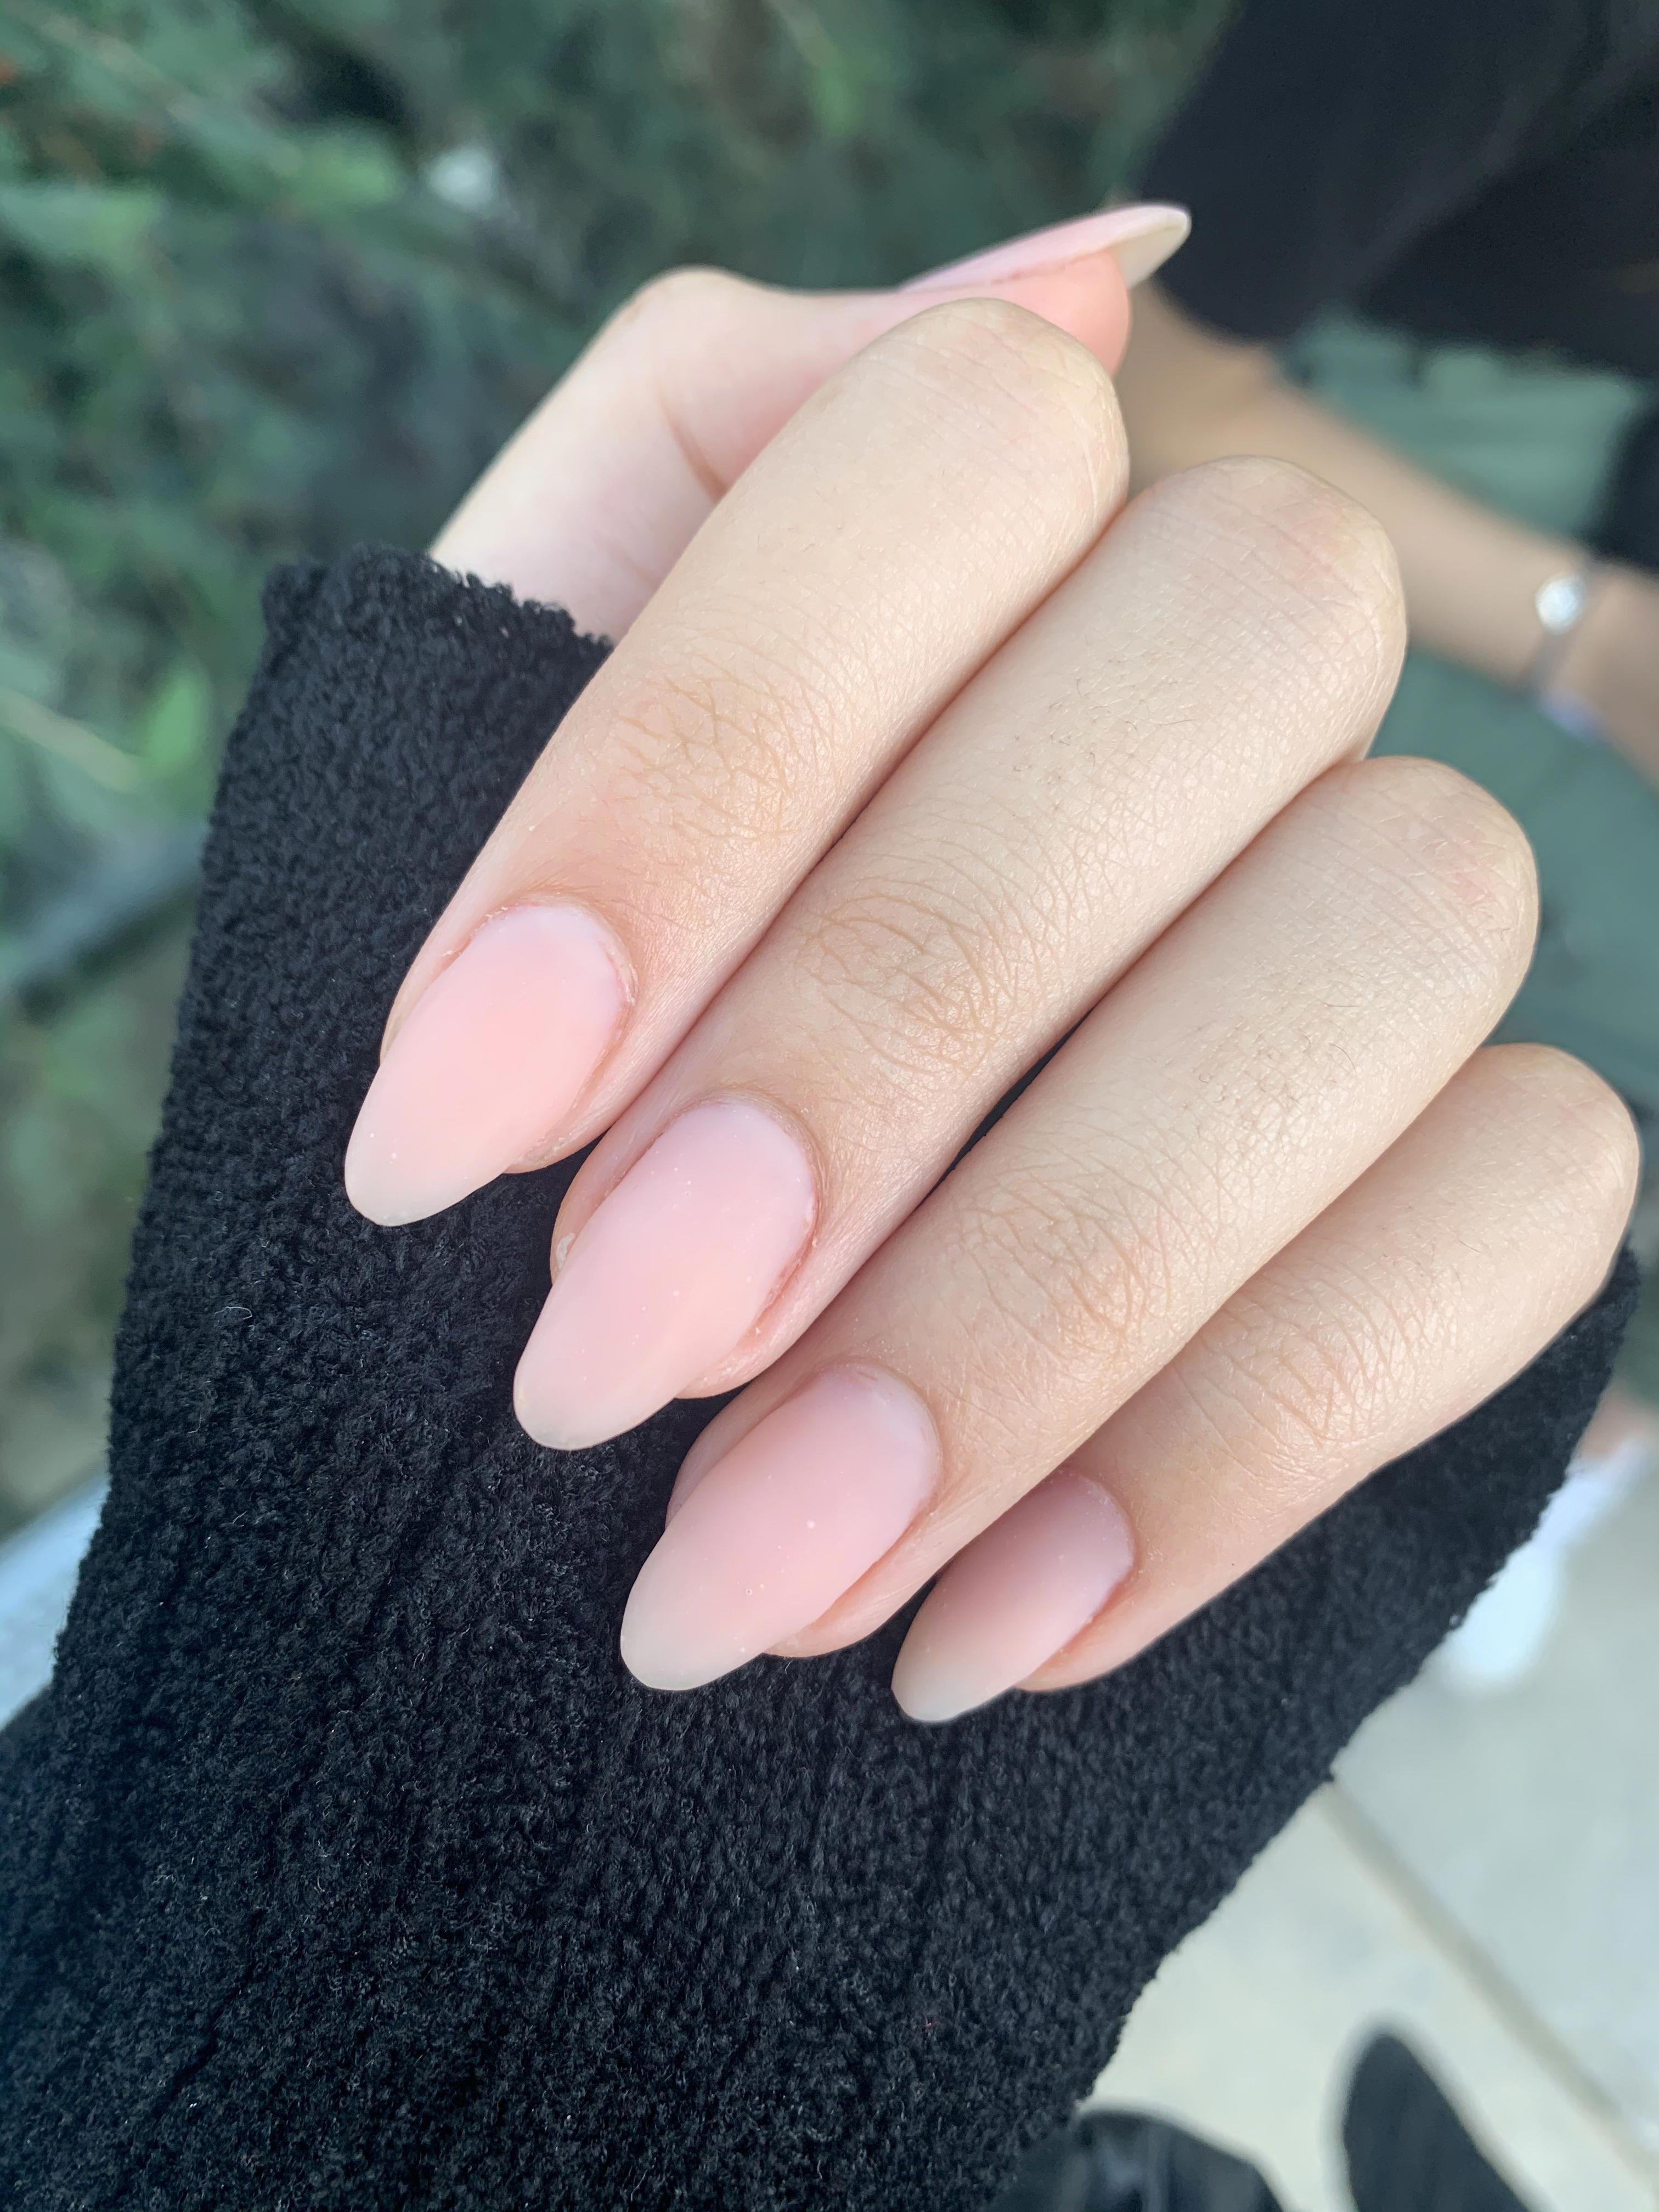 Oval Almond Matte Natural Nails Protez Acrylic Nail Art Pinkish Pink Acrylicnailsshort In 2020 Light Pink Acrylic Nails Purple Acrylic Nails Green Acrylic Nails